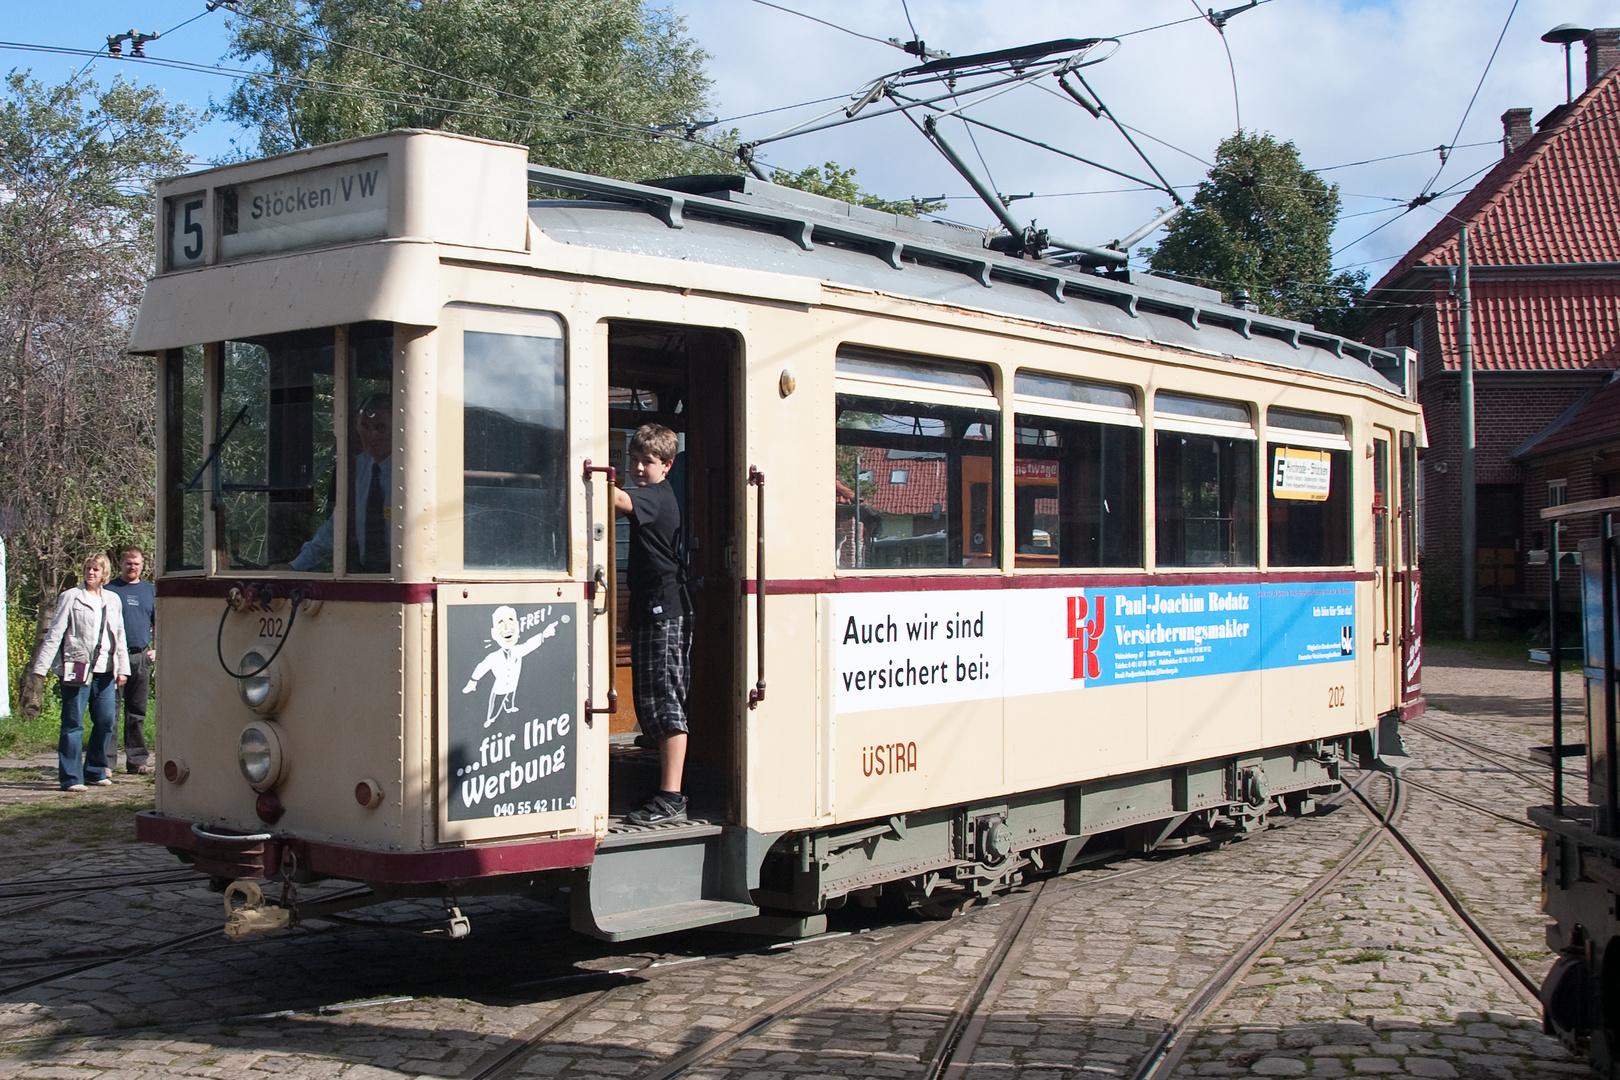 Straßenbahn im Betrieb (1)